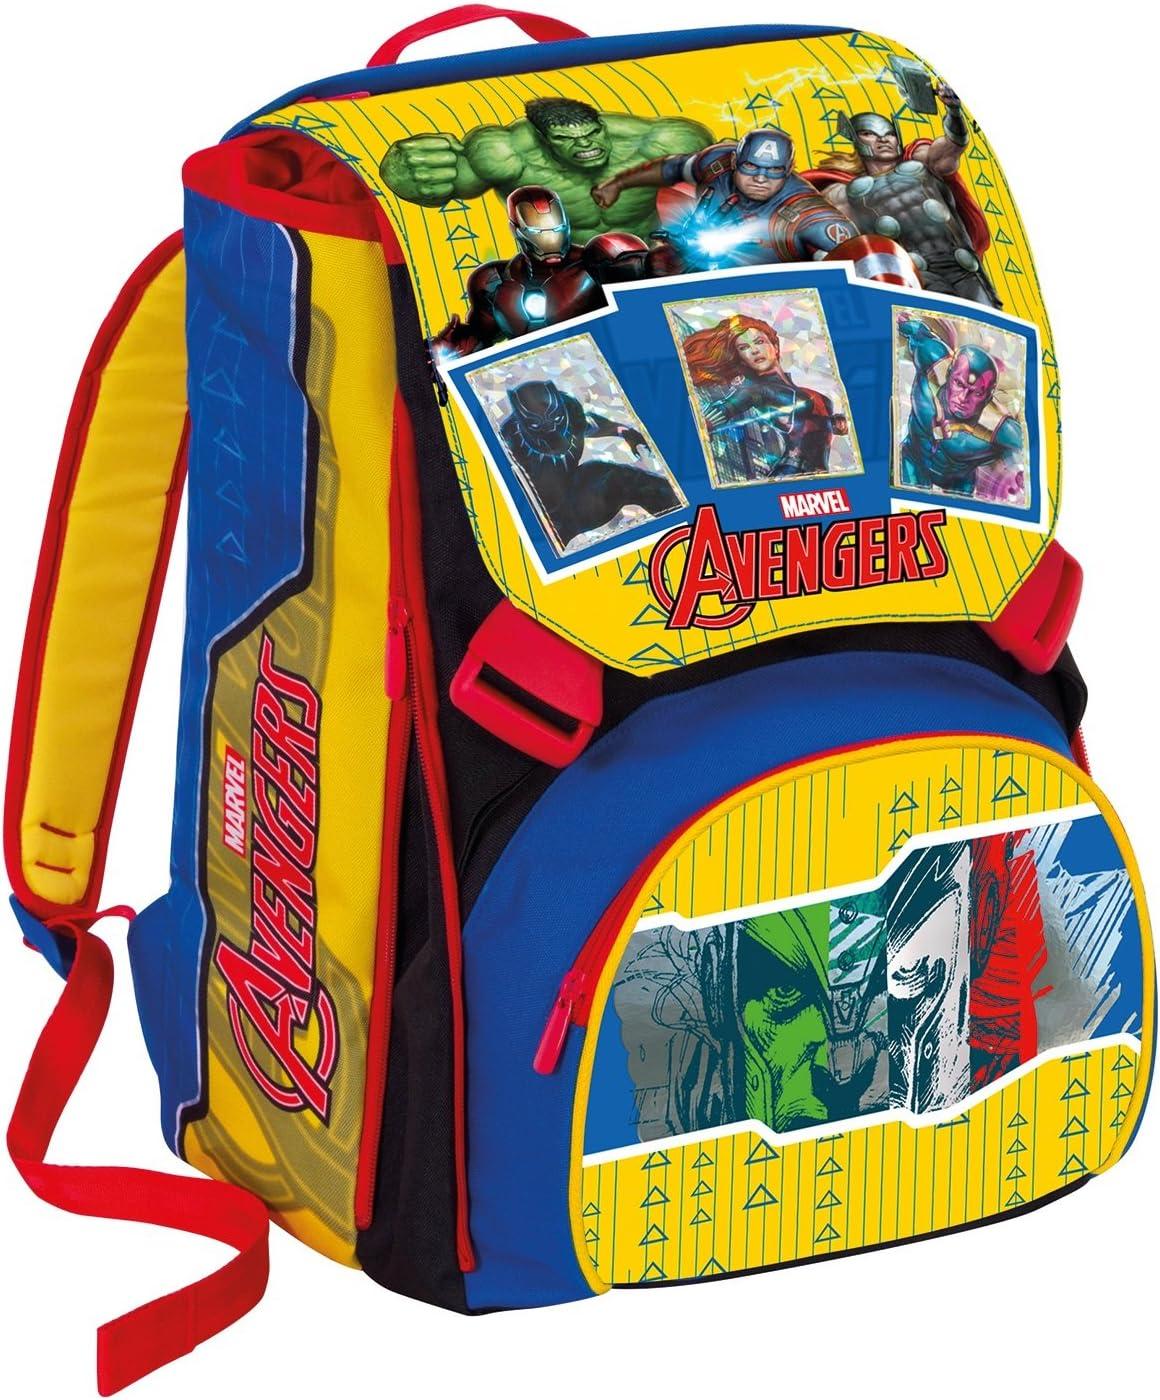 Erweiterbarer Rucksack Marvel Avengers Gelb Rot Magnetkarte Schulranzen 31lt Koffer Rucksäcke Taschen